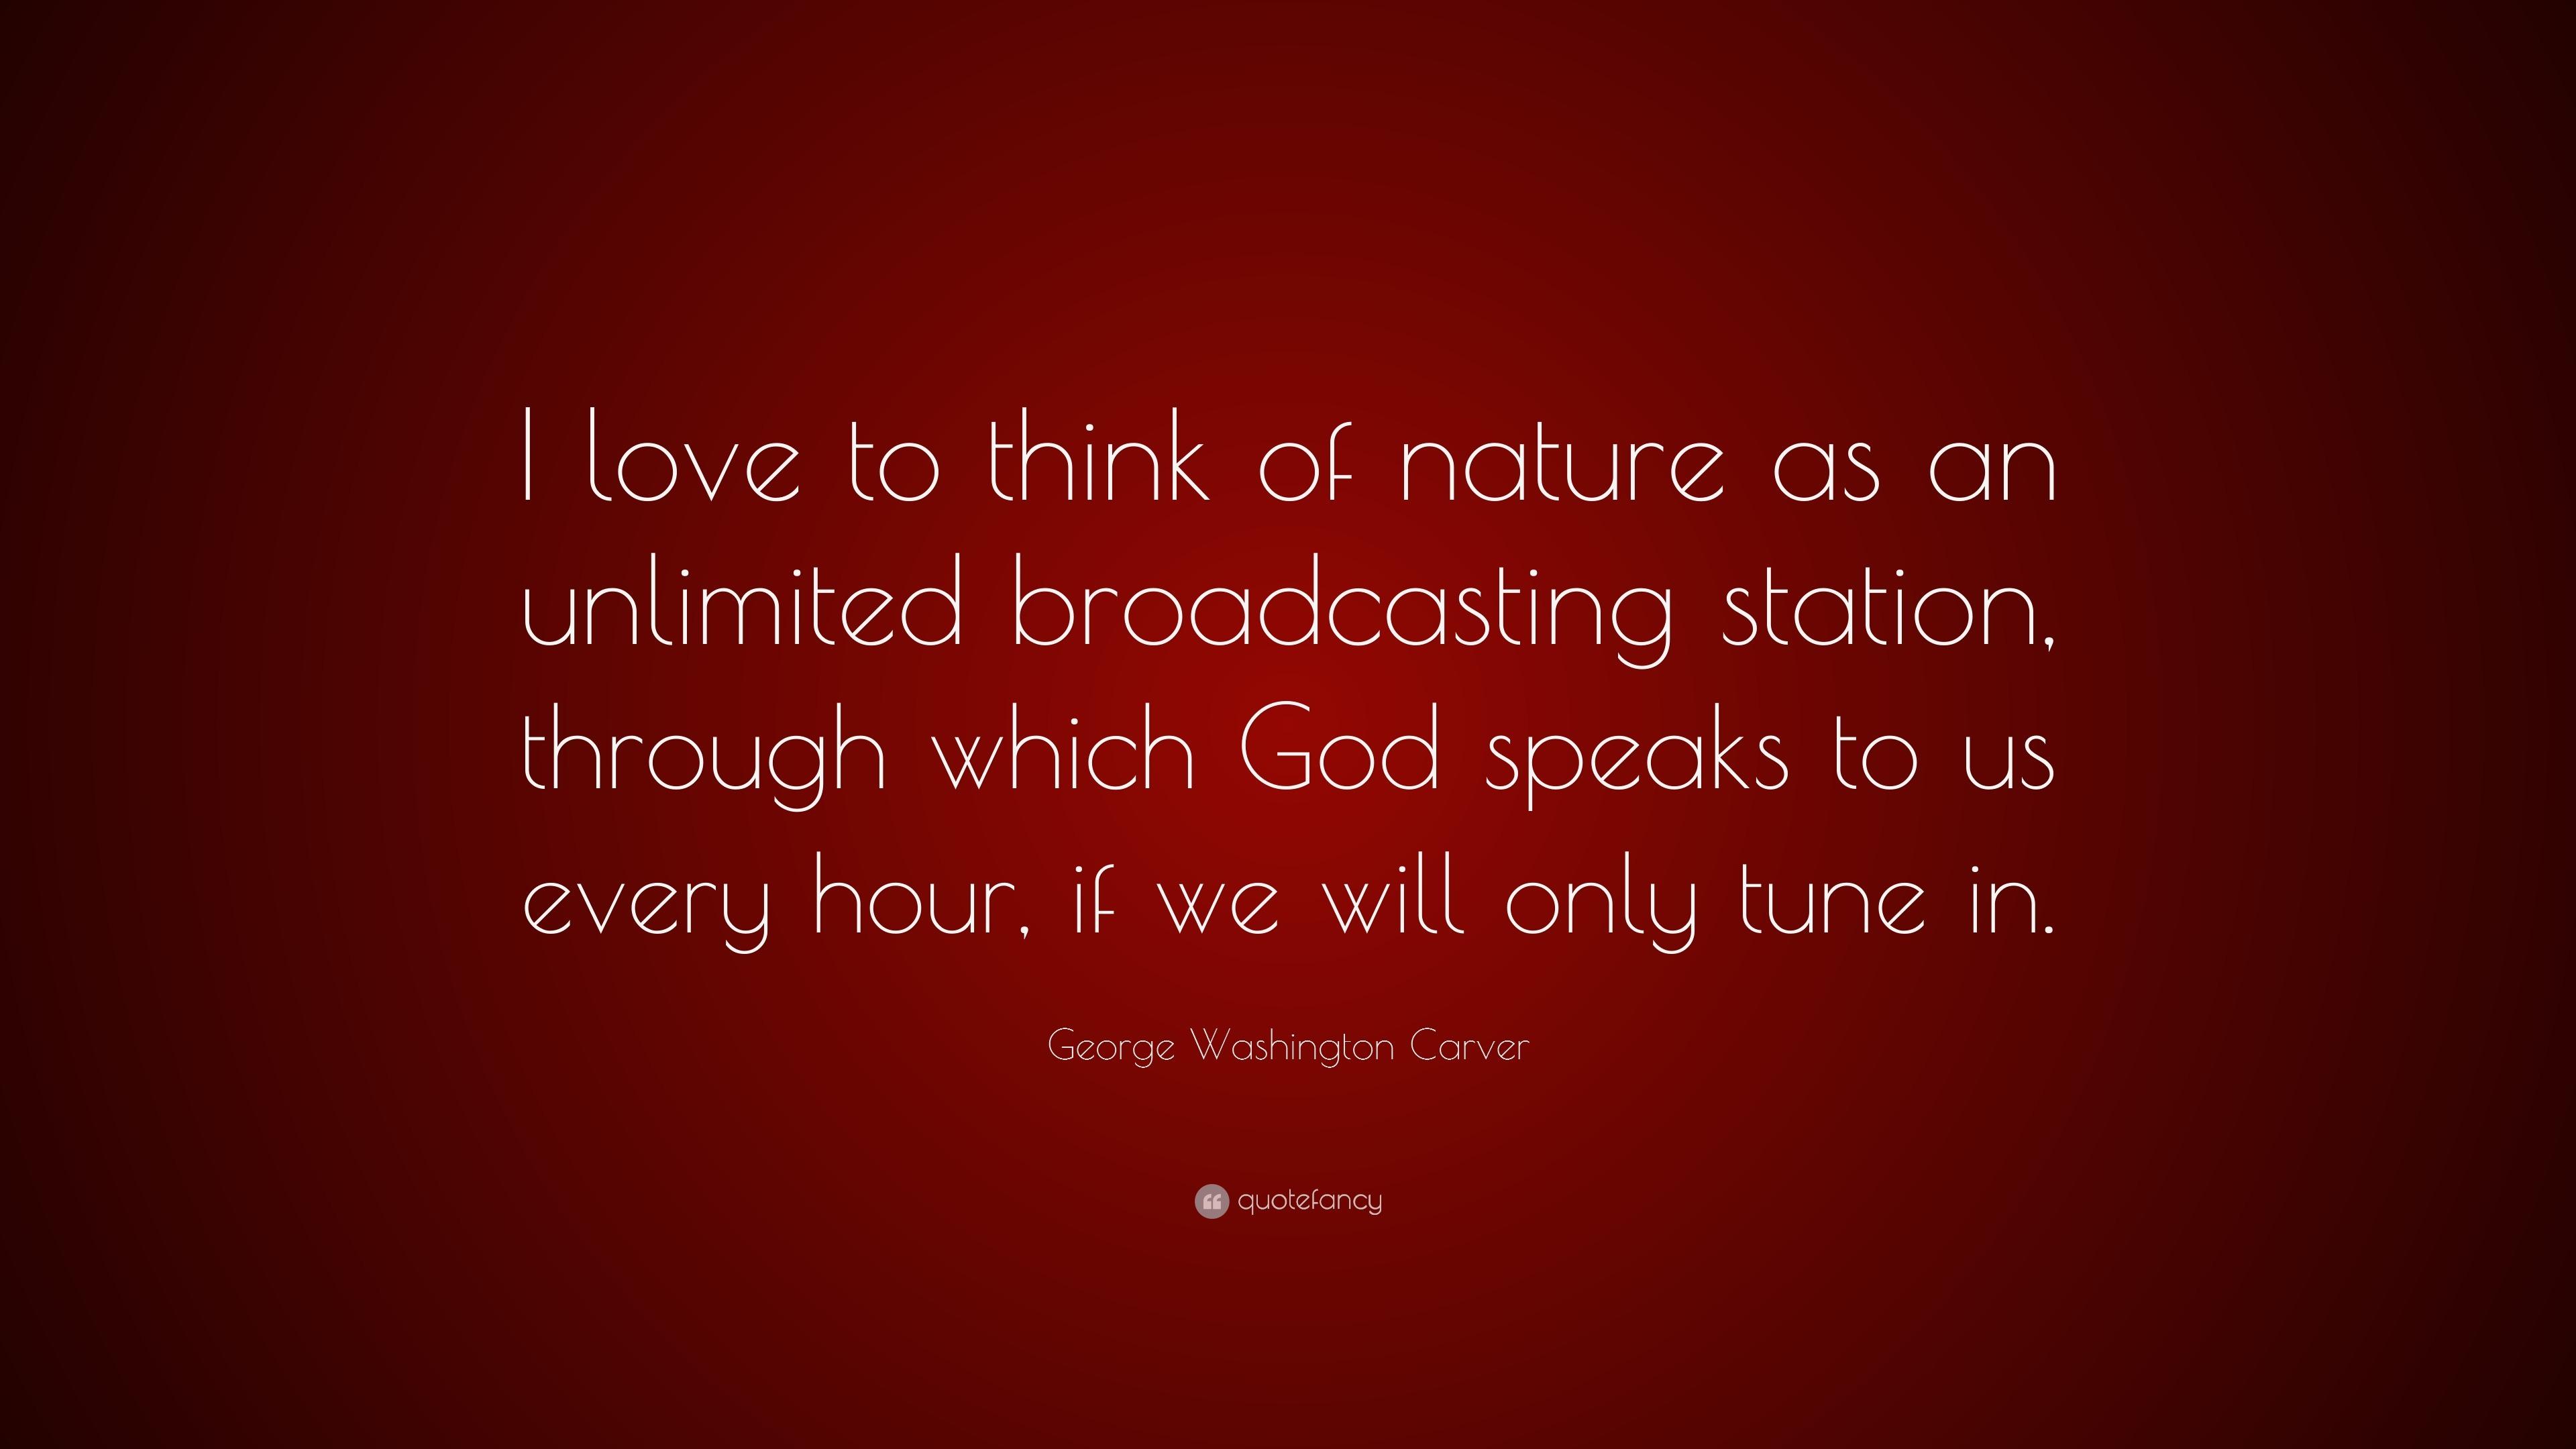 george washington carver quote ldquo i love to think of nature as an george washington carver quote ldquoi love to think of nature as an unlimited broadcasting